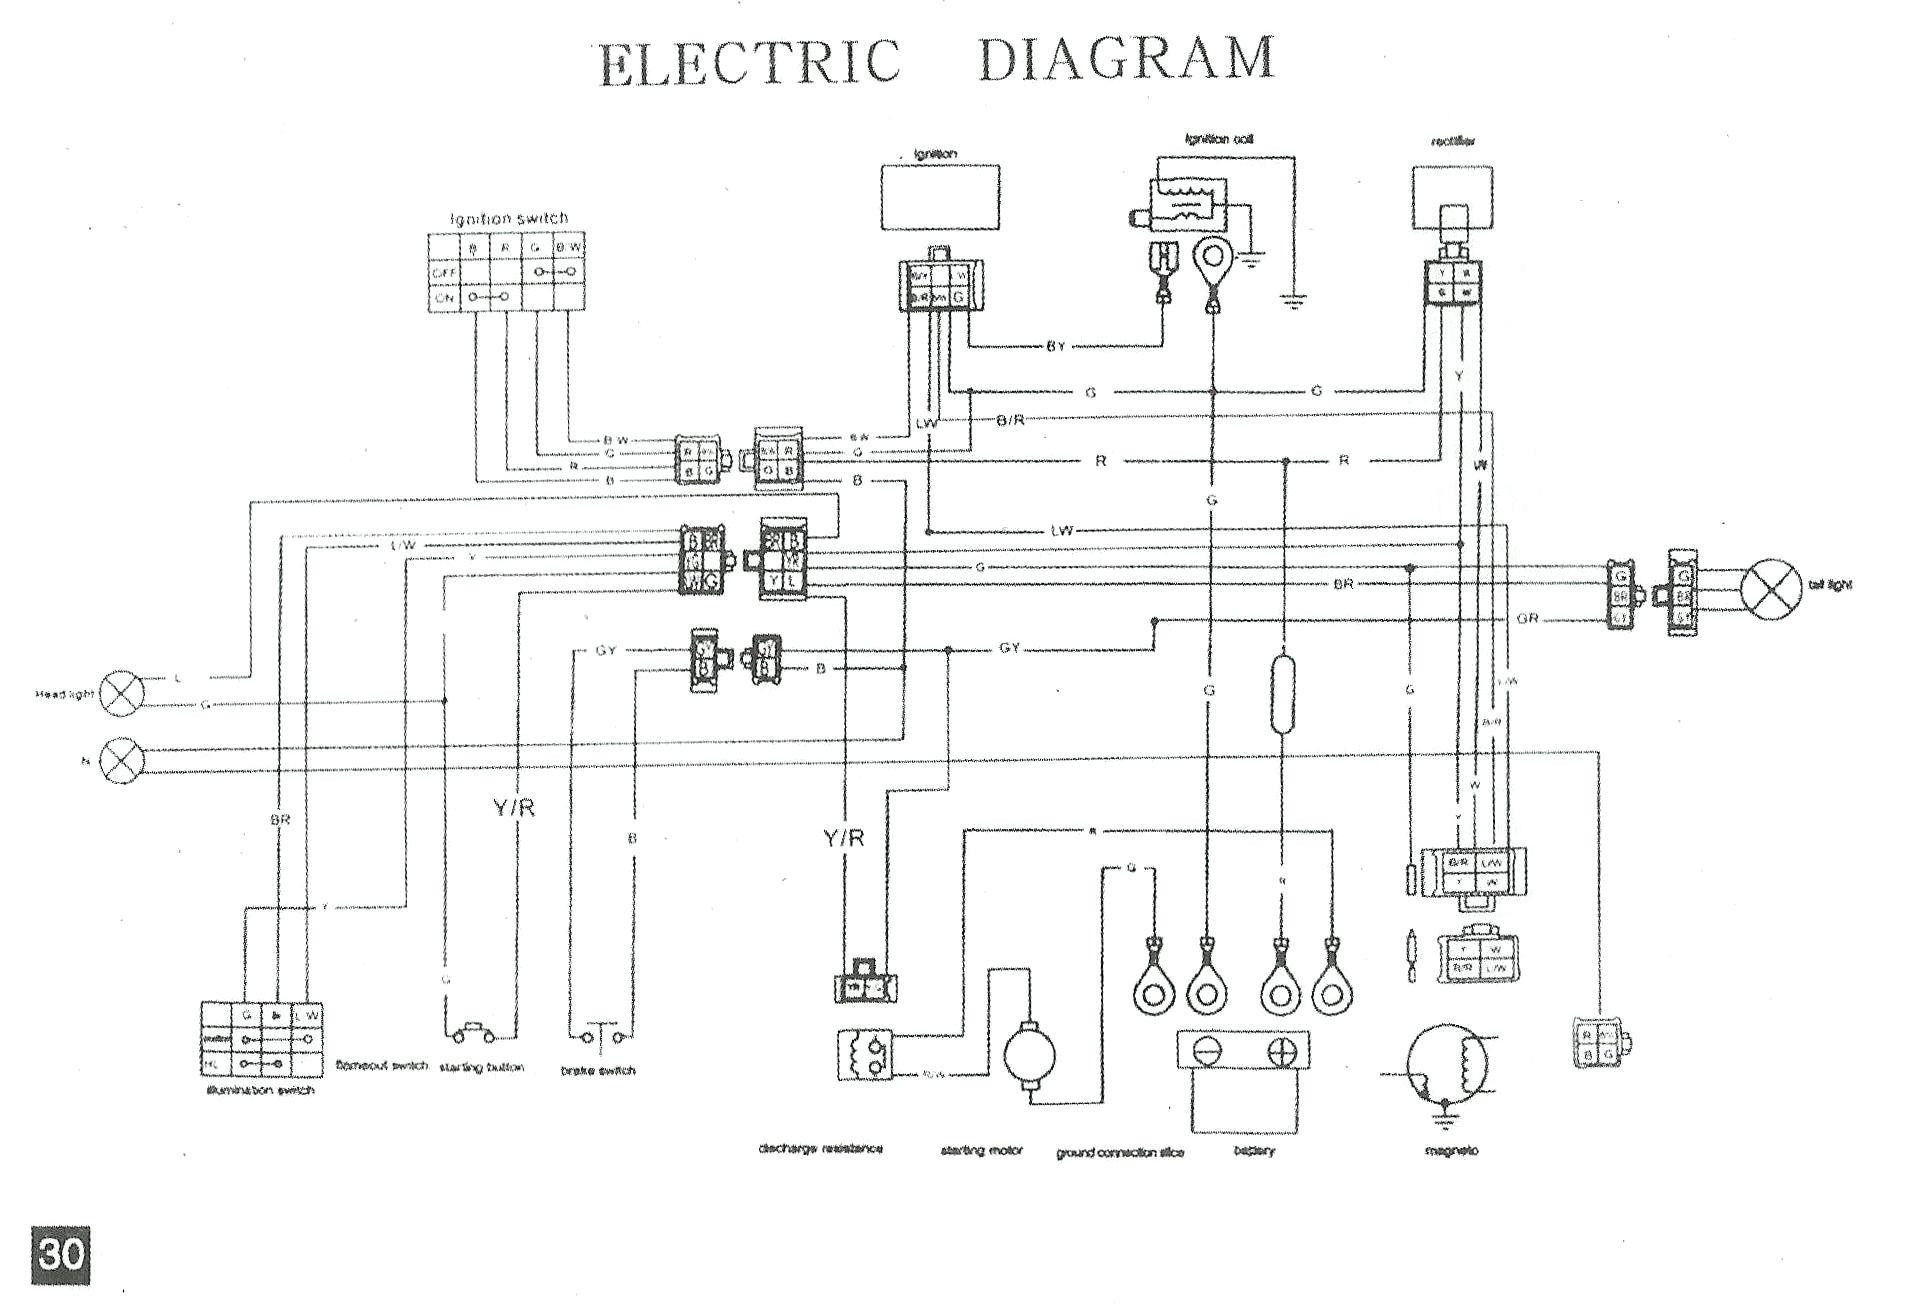 hight resolution of kasea wiring diagram go wiring diagram 50cc chinese scooter wiring diagram